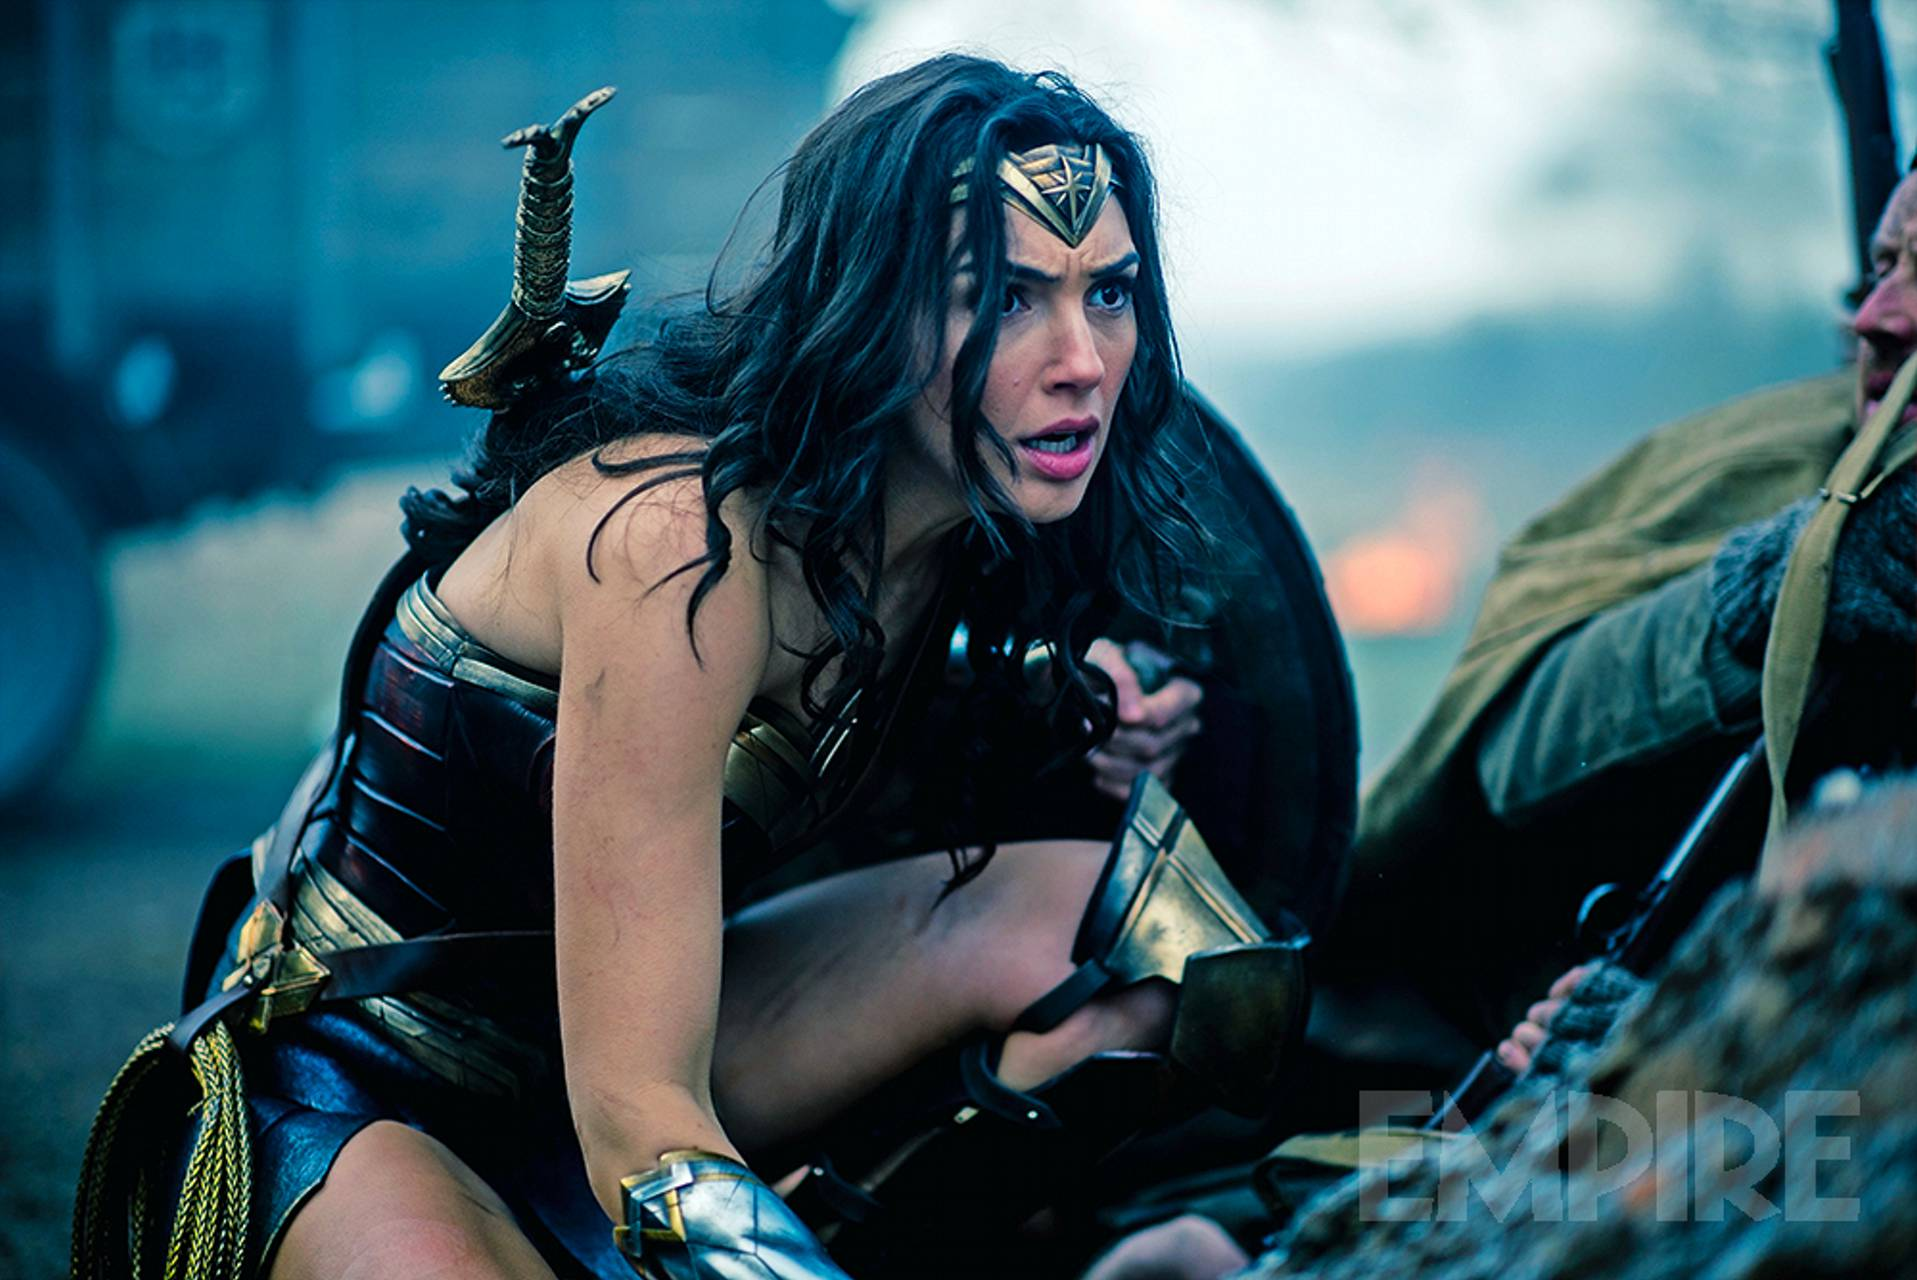 Wonder Woman, played by Gal Gadot, crouching on a battlefield